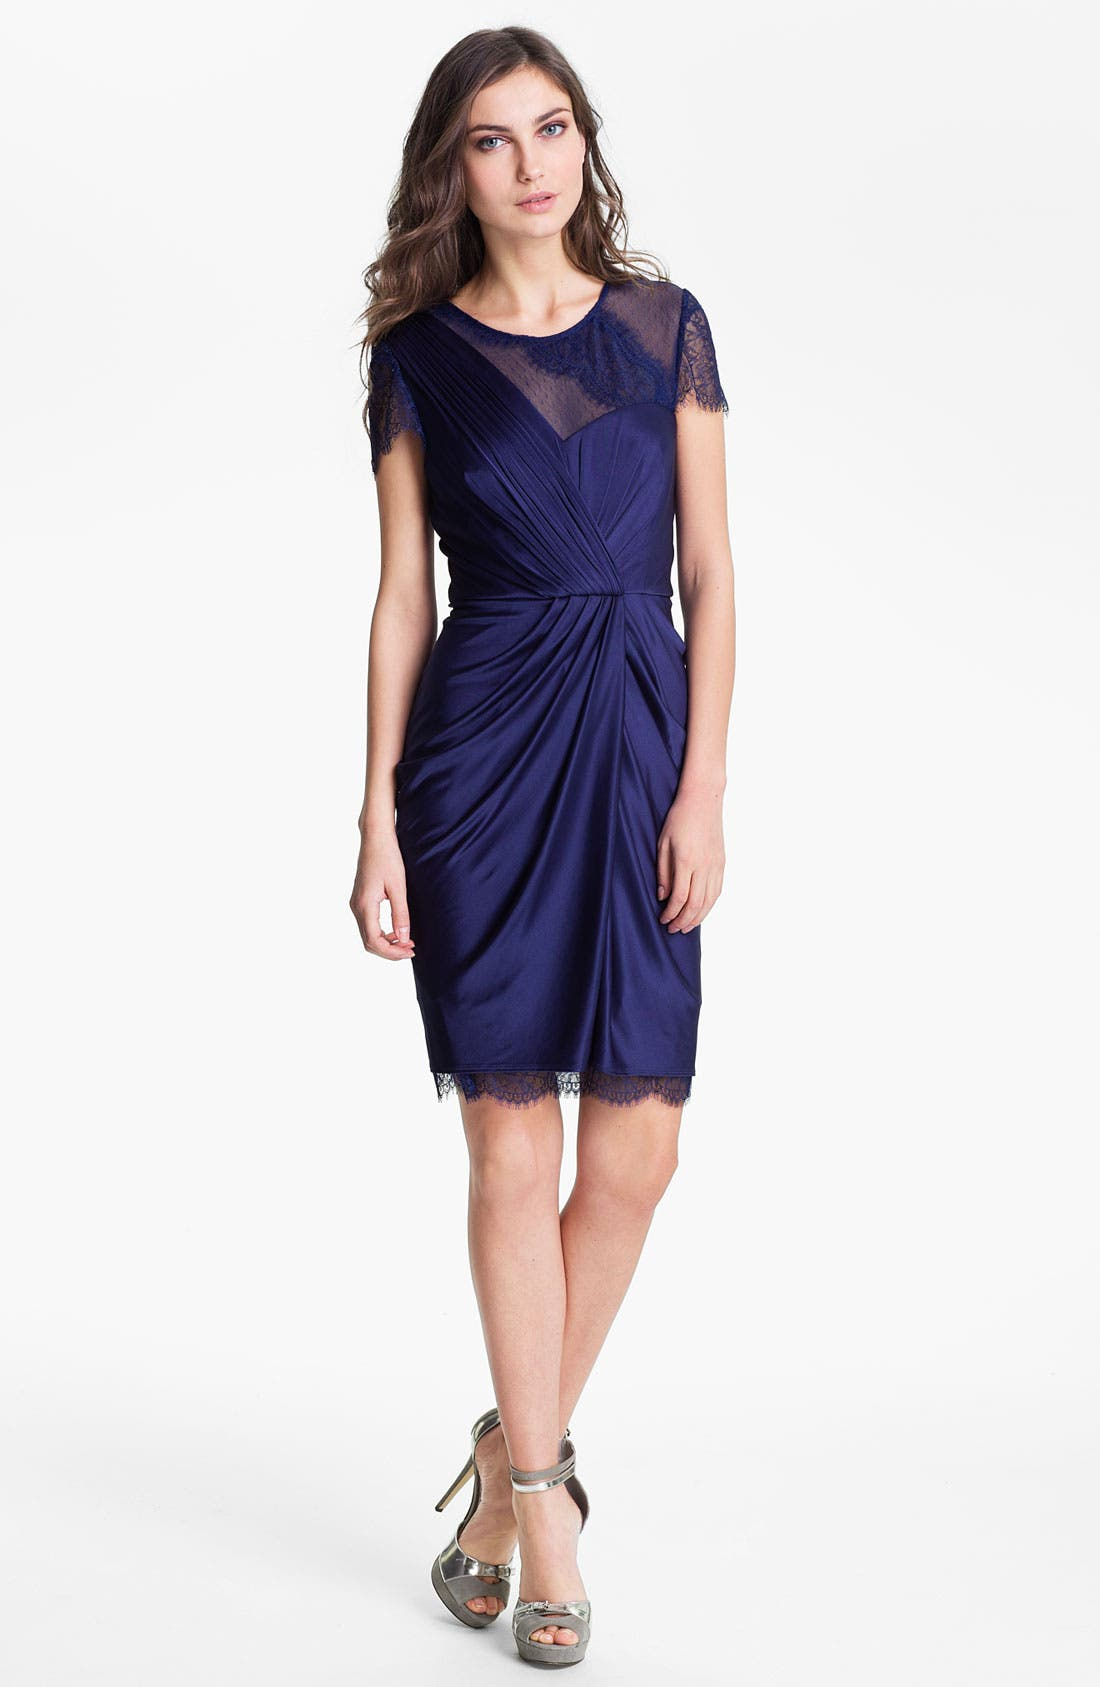 Alternate Image 1 Selected - BCBGMAXAZRIA Lace Sleeve Gathered Jersey Dress